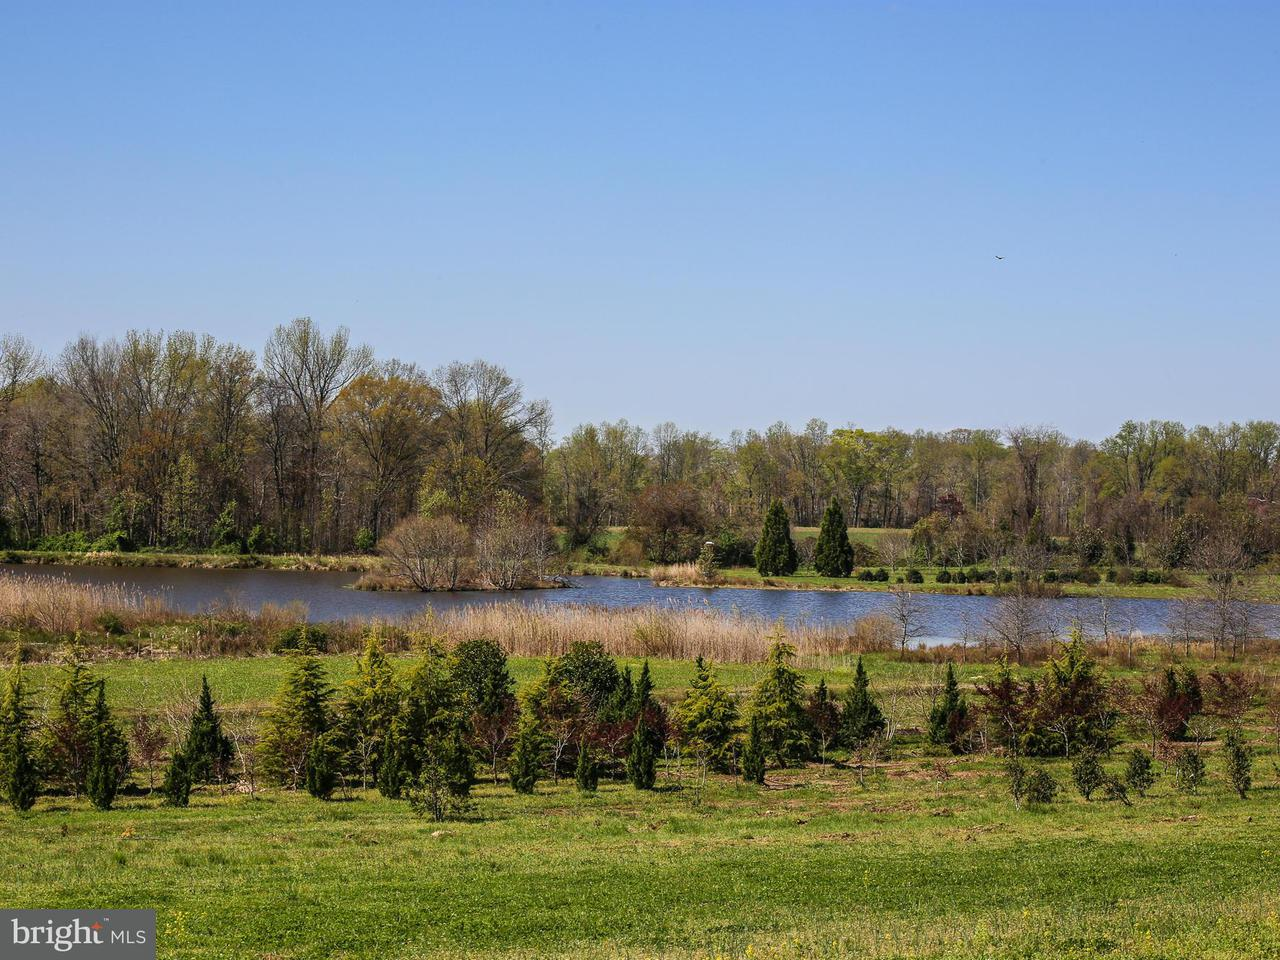 Terreno por un Venta en 12474 STILL POND Road 12474 STILL POND Road Still Pond, Maryland 21667 Estados Unidos